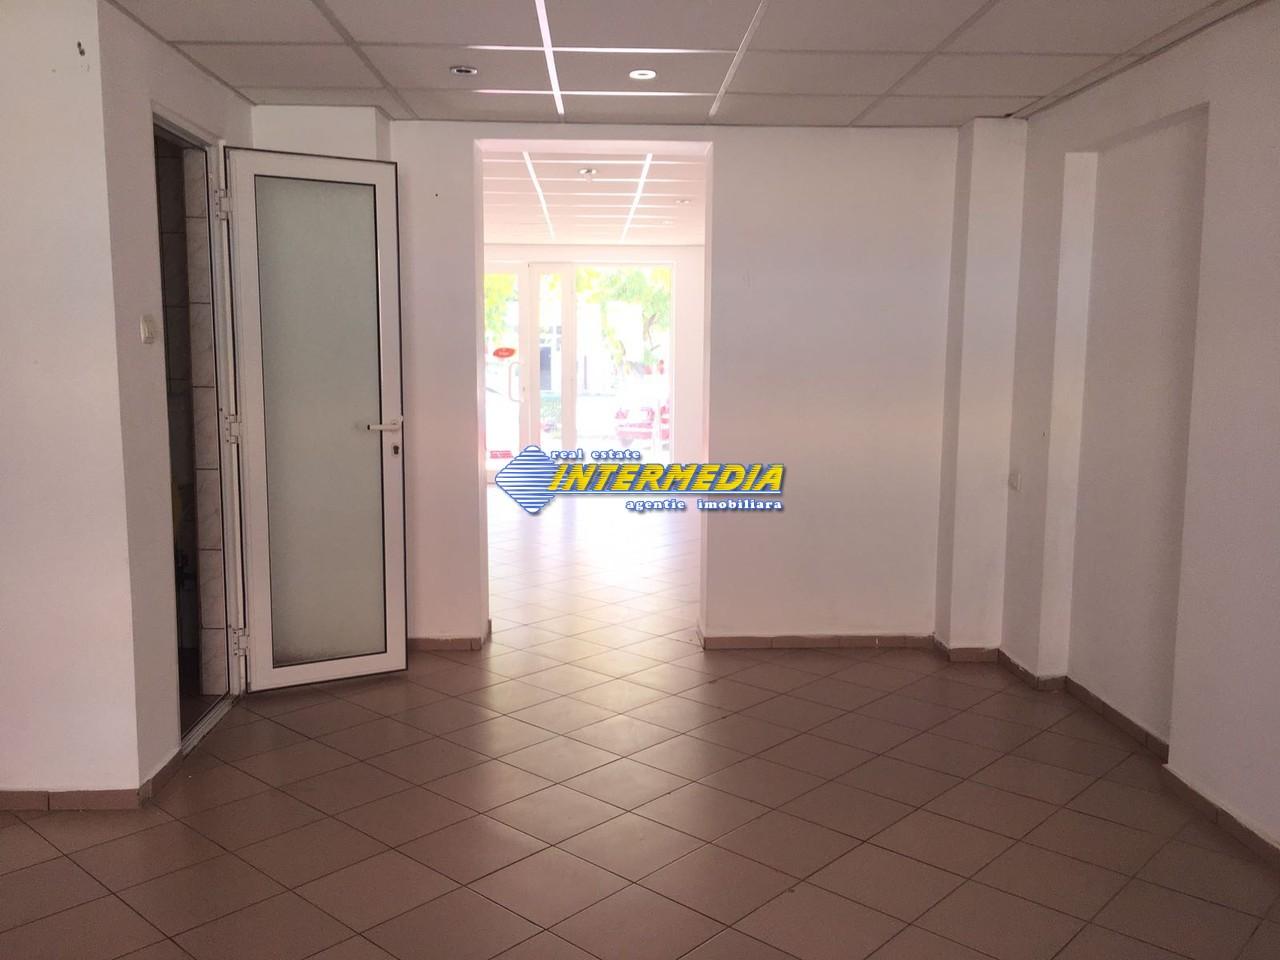 Spatiu comercial de vanzare 155 mp. la Bulevard in Alba Iulia Ocazie !-33416-0